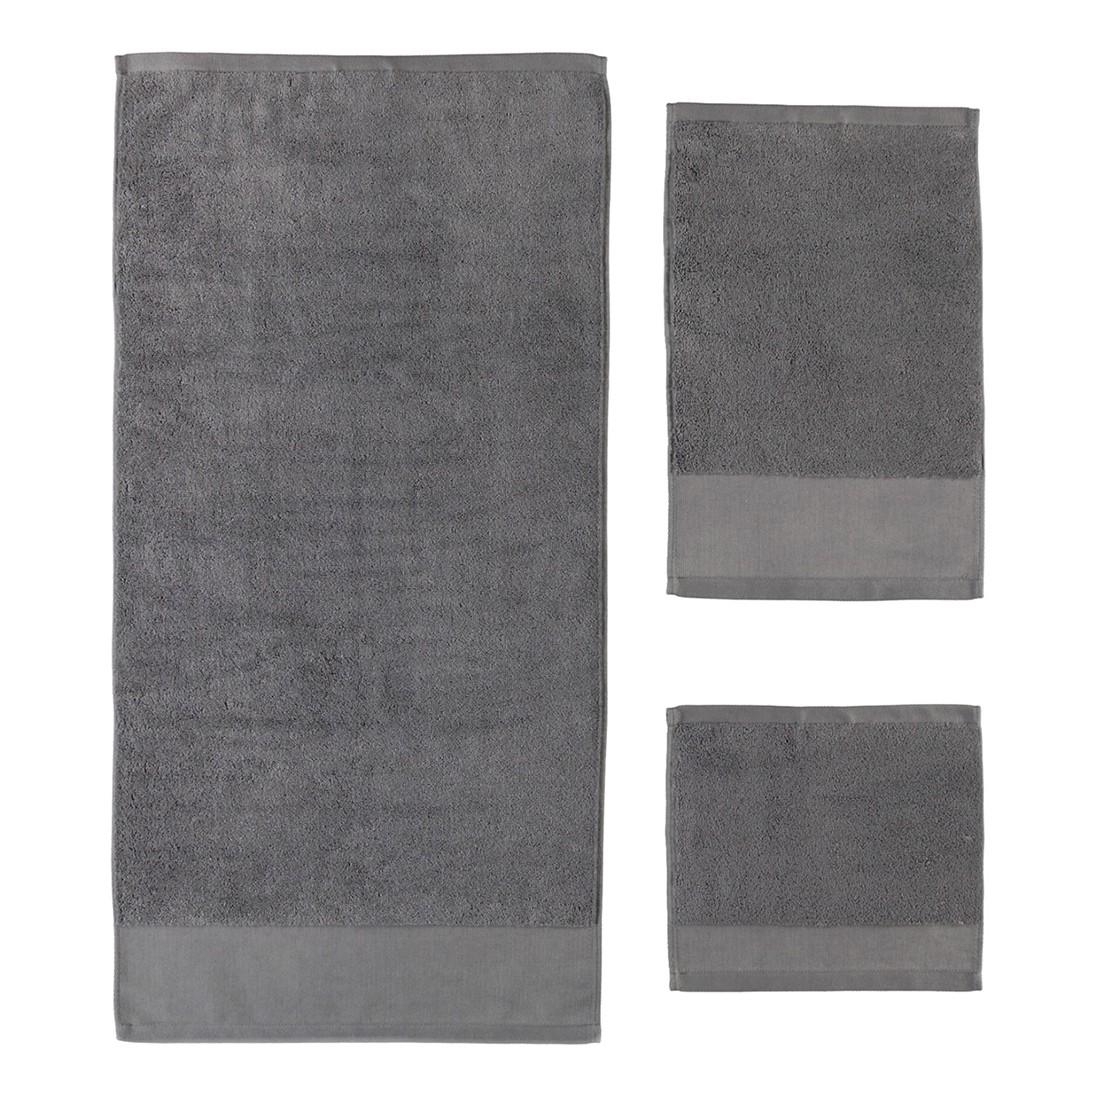 Handtuch Comtesse – 100% Baumwolle zinn – 02 – Gästetuch: 30 x 50 cm, Rhomtuft online kaufen